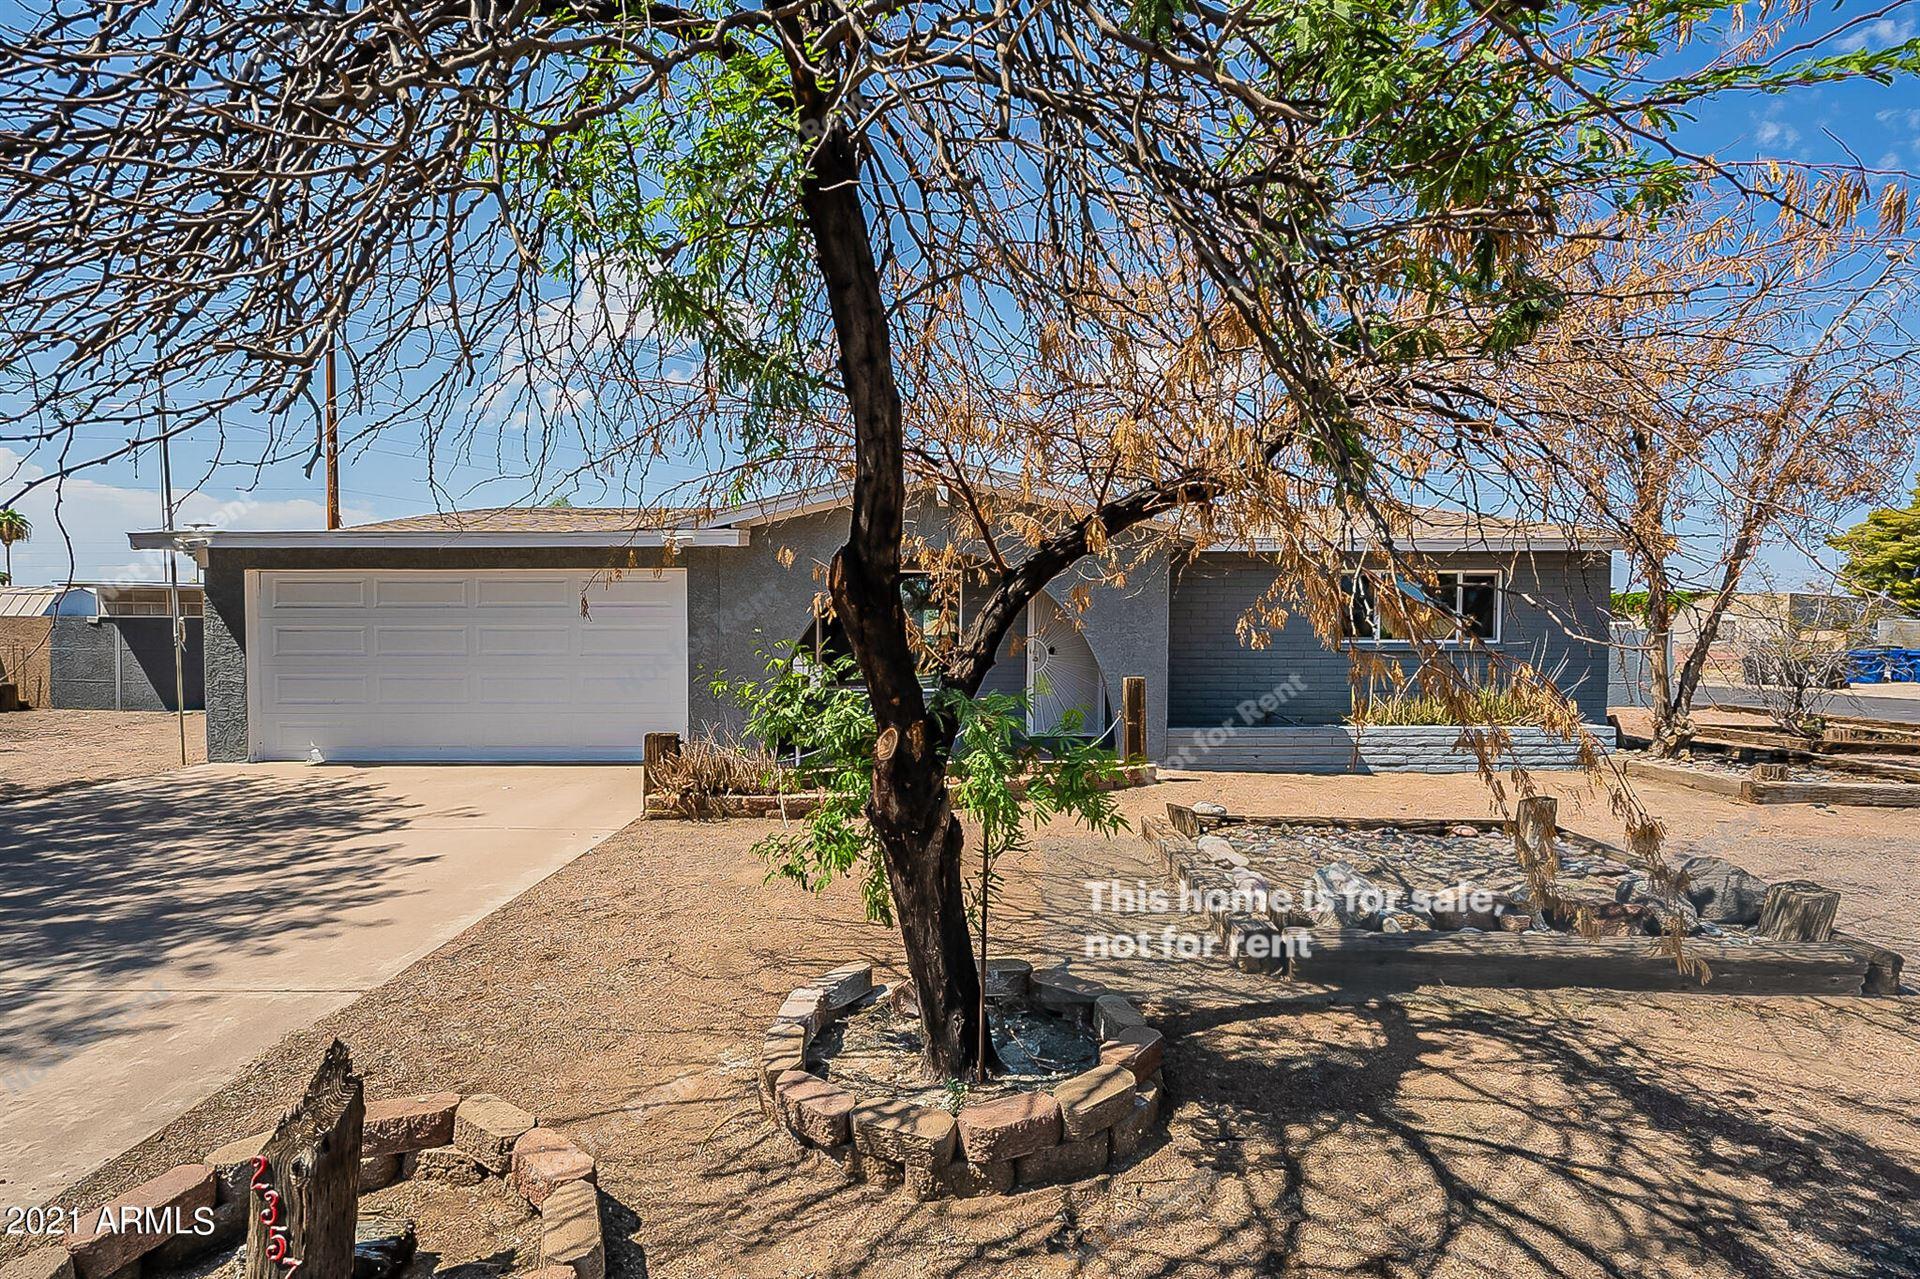 Photo of 2357 W EL MORO Circle, Mesa, AZ 85202 (MLS # 6296343)